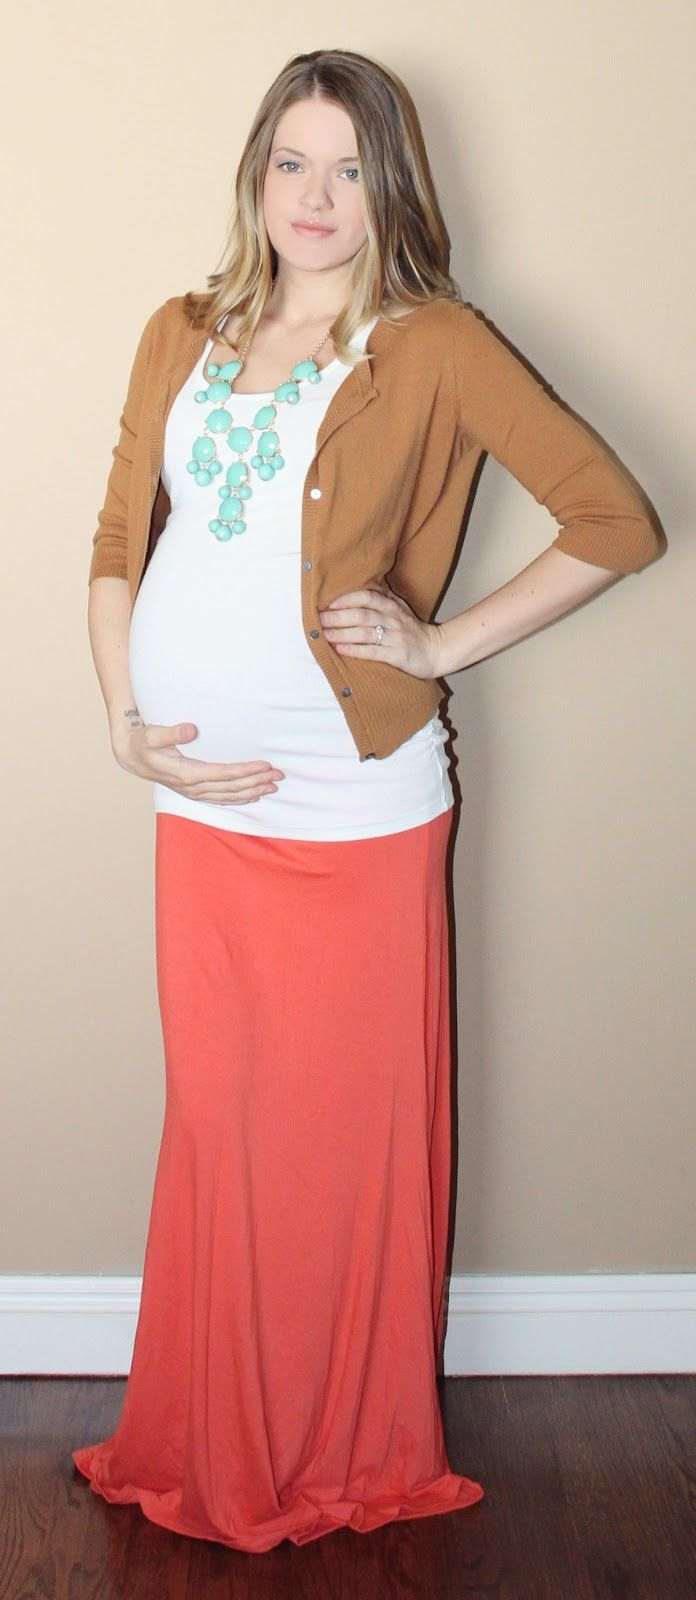 The 25+ best Weekly maternity photos ideas on Pinterest ...